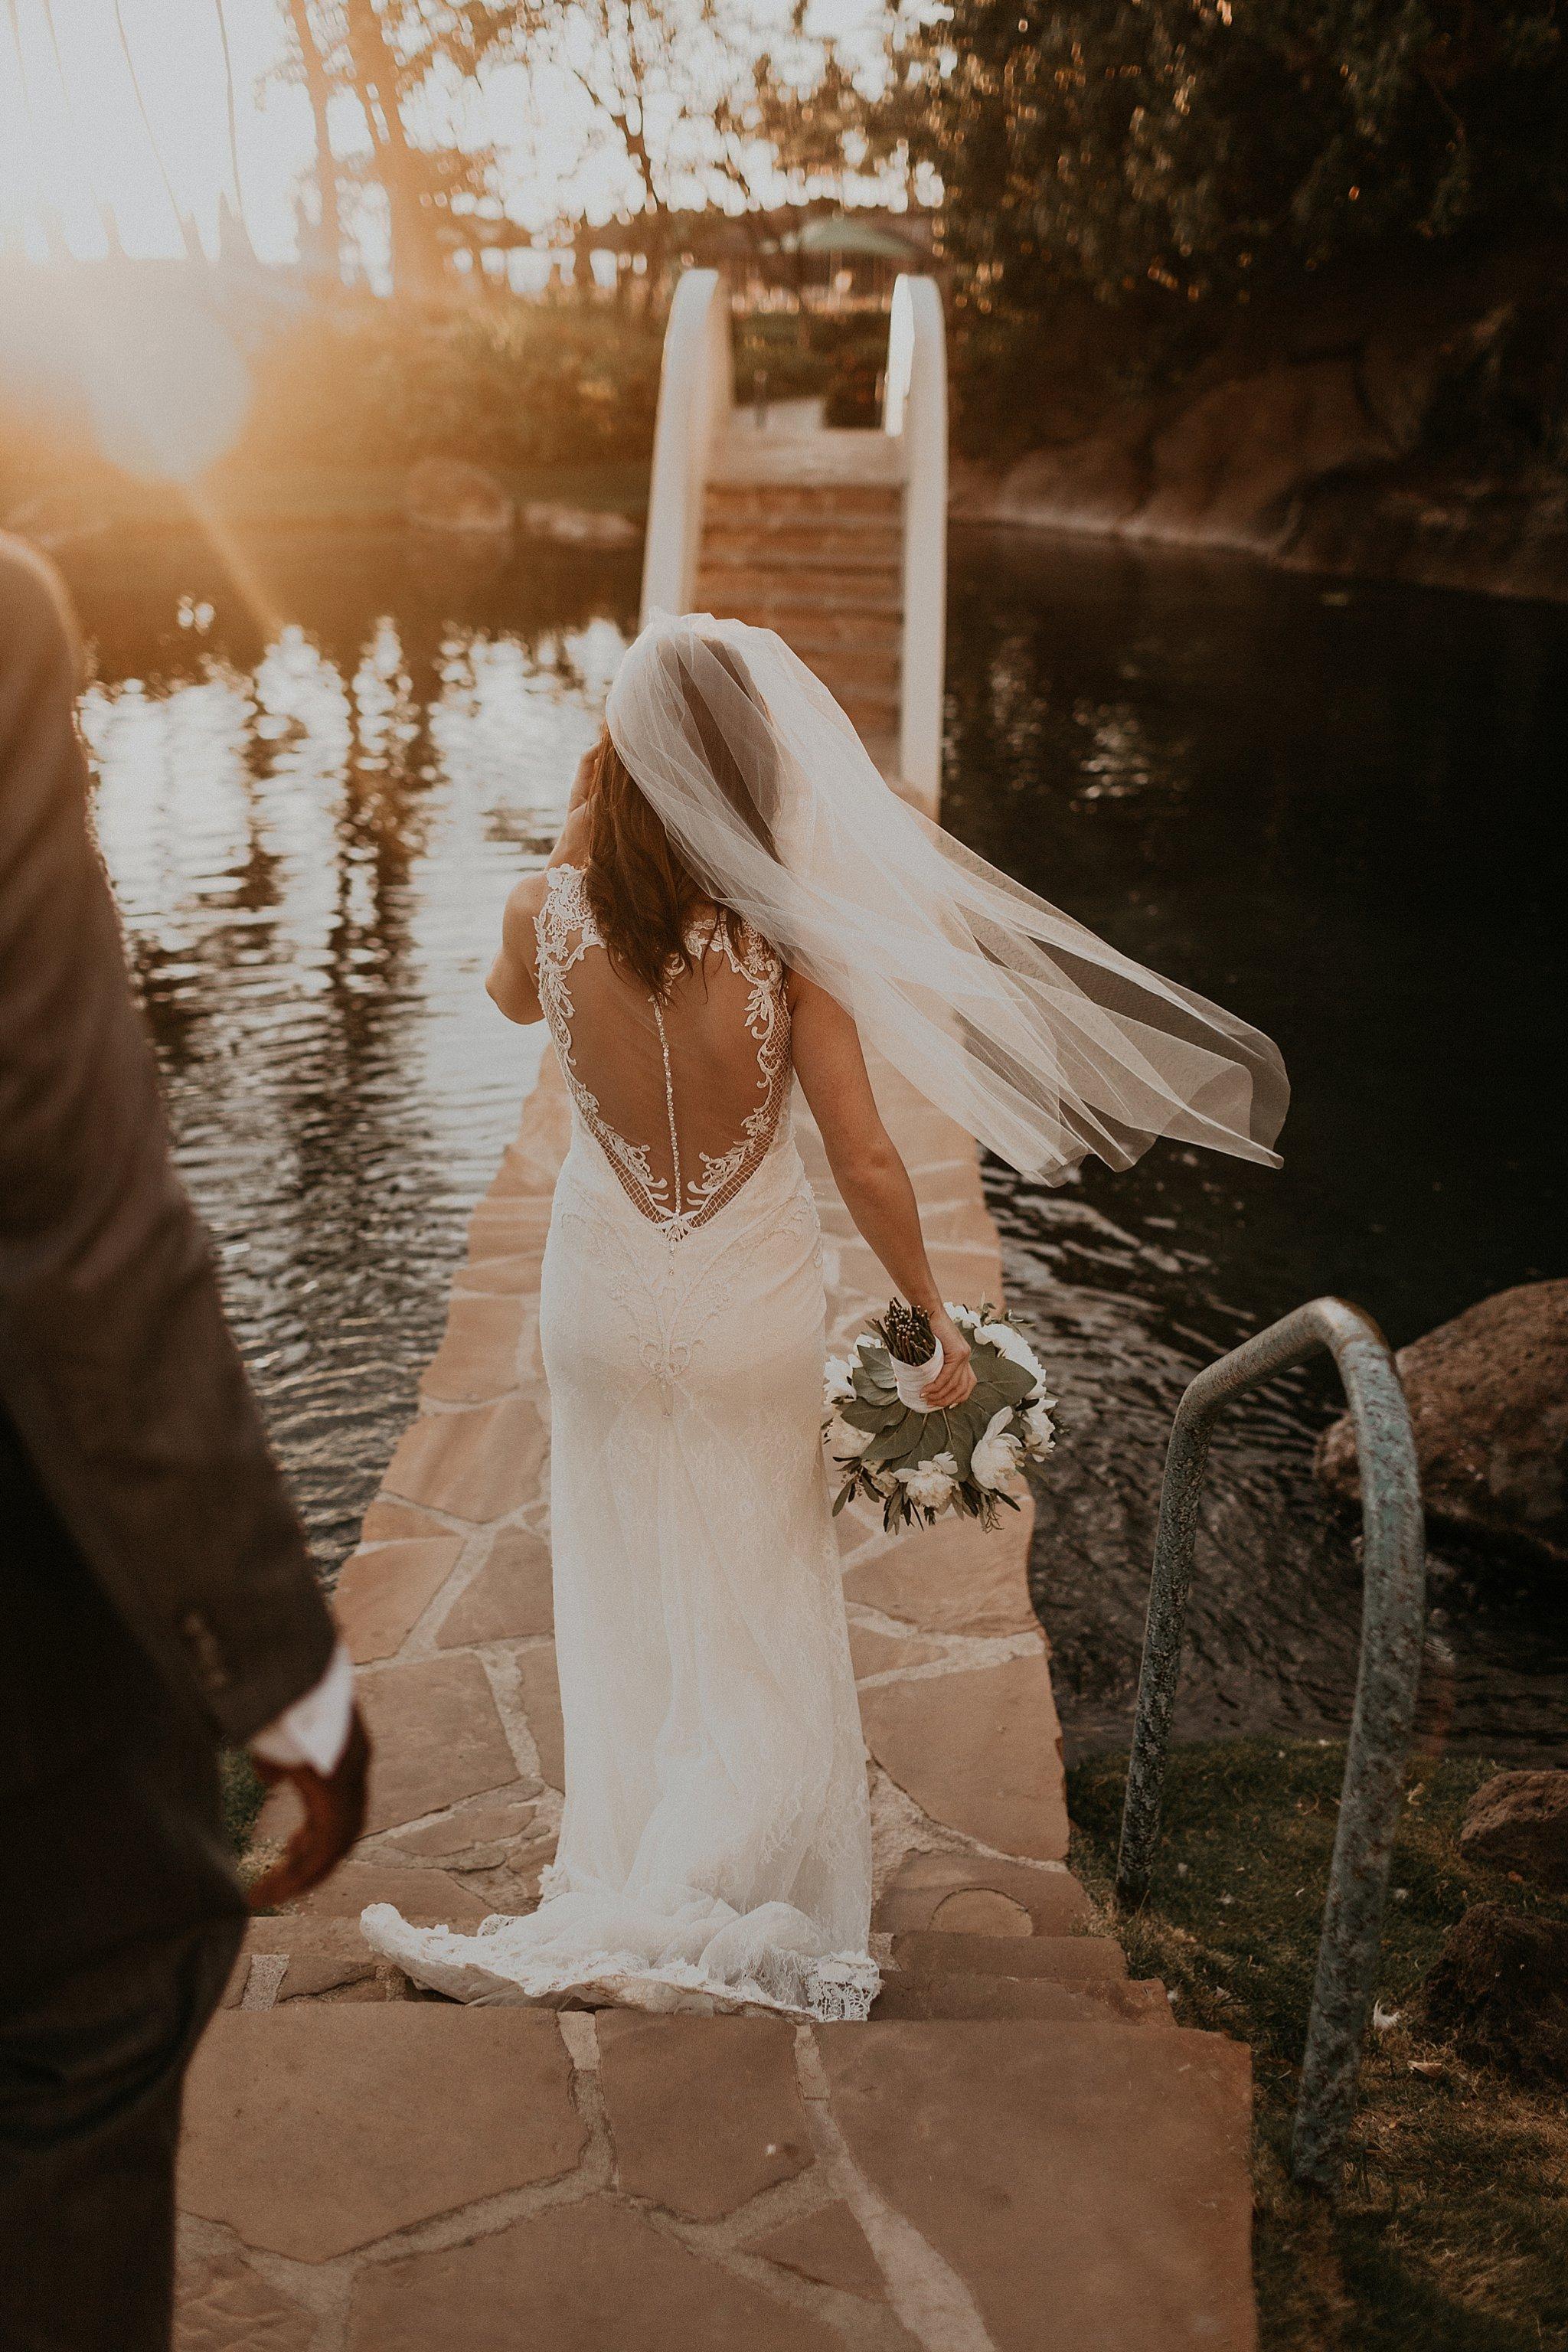 samantha_mcfarlen_bellingham_washington_engagement_photography_seattle_wedding_photographer_0269.jpg